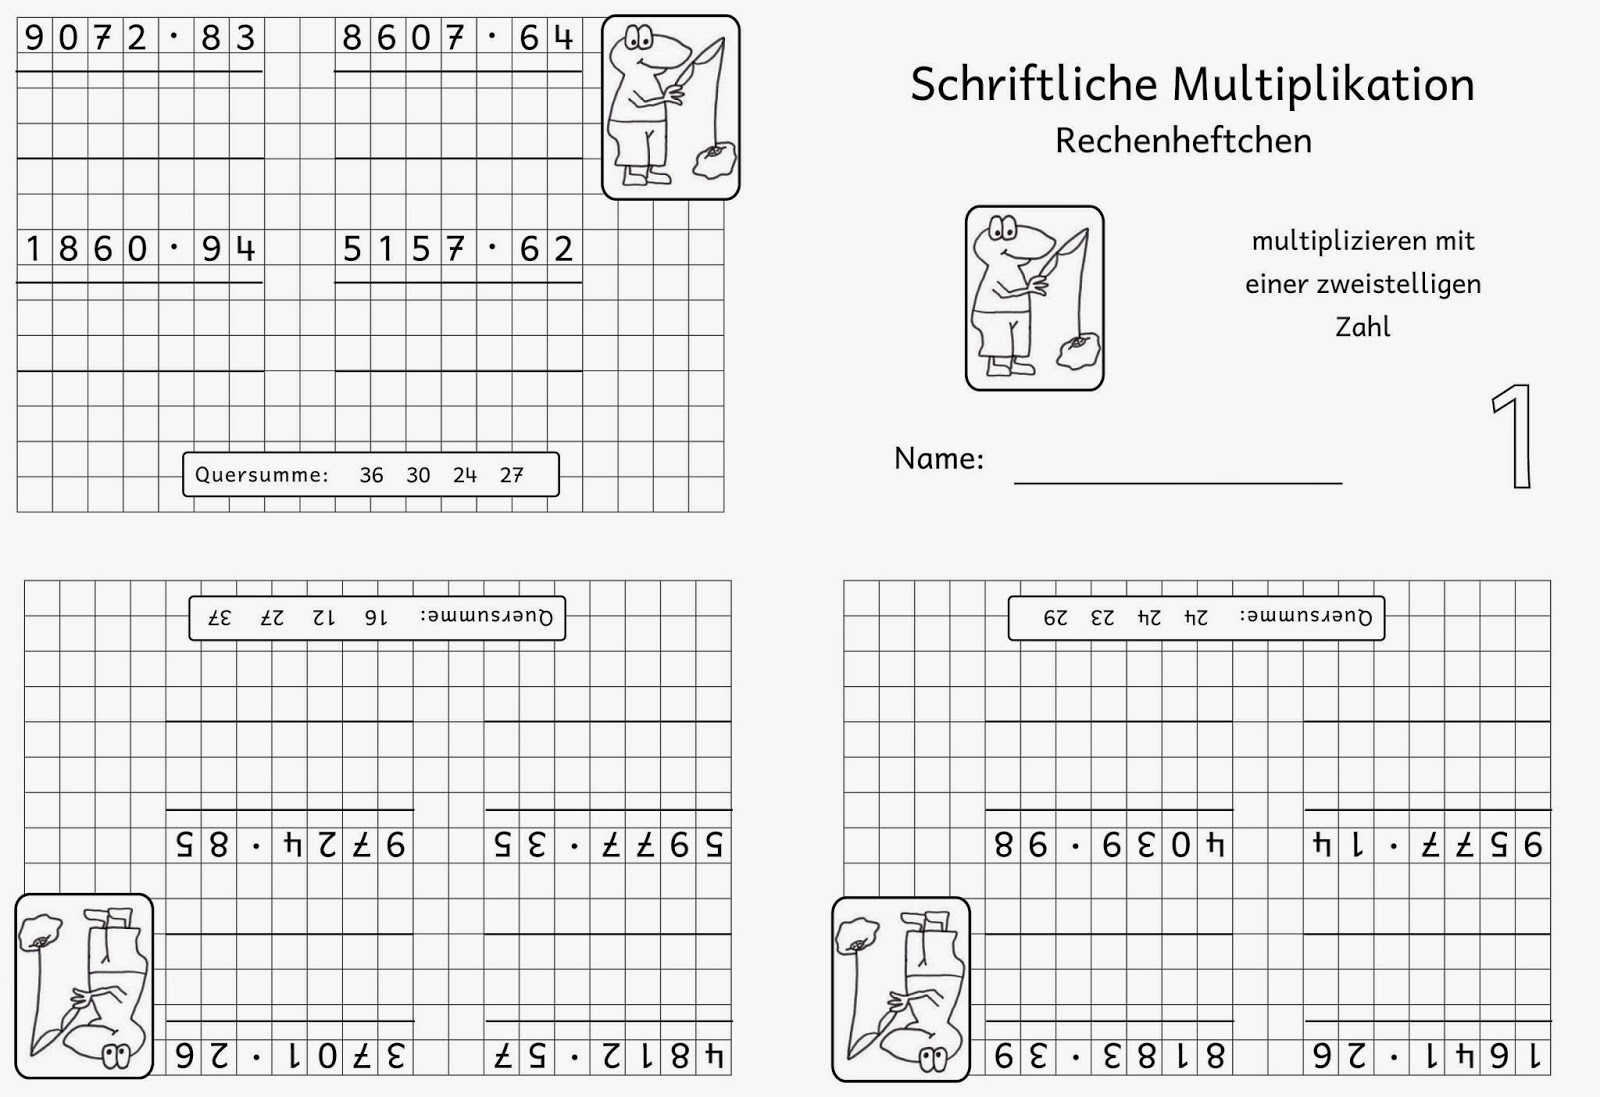 Klecksaufgaben mathe 3 klasse entwurf 3156999 - memorables.info